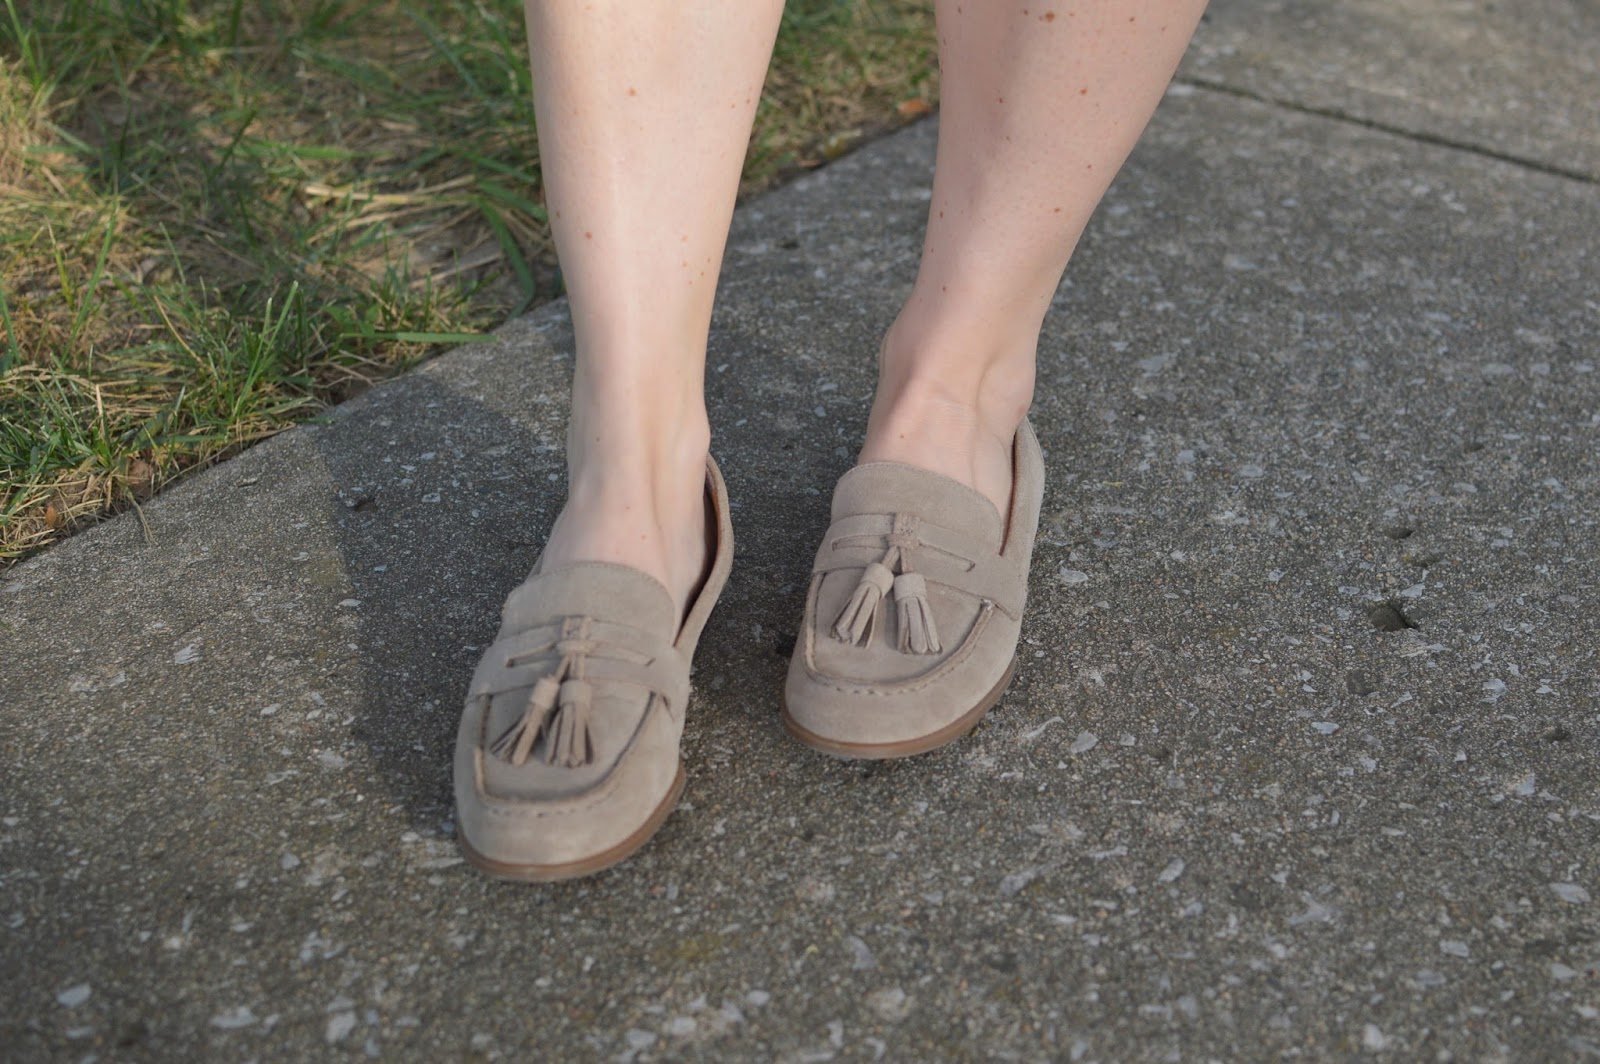 tommy hilfiger loafers | cute loafers | beige tassel loafers